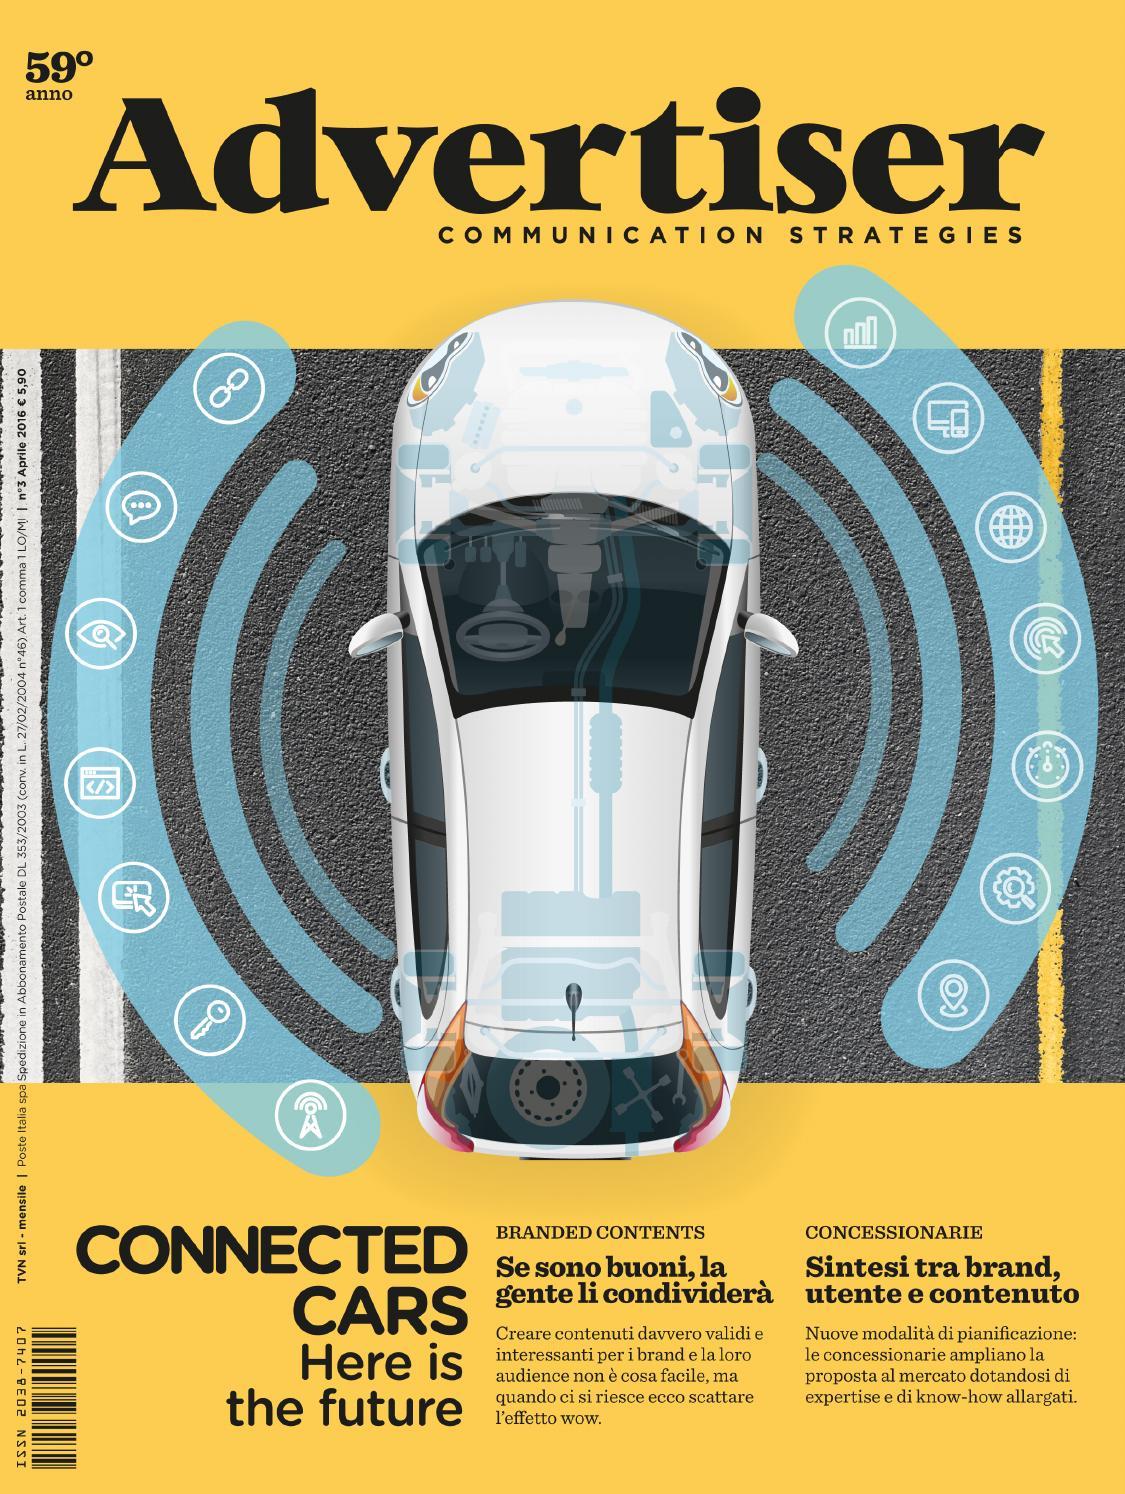 ADVERTISER Communication Strategies 03 2016 by ADV Strategie di  Comunicazione - issuu 3c0b0211ac4